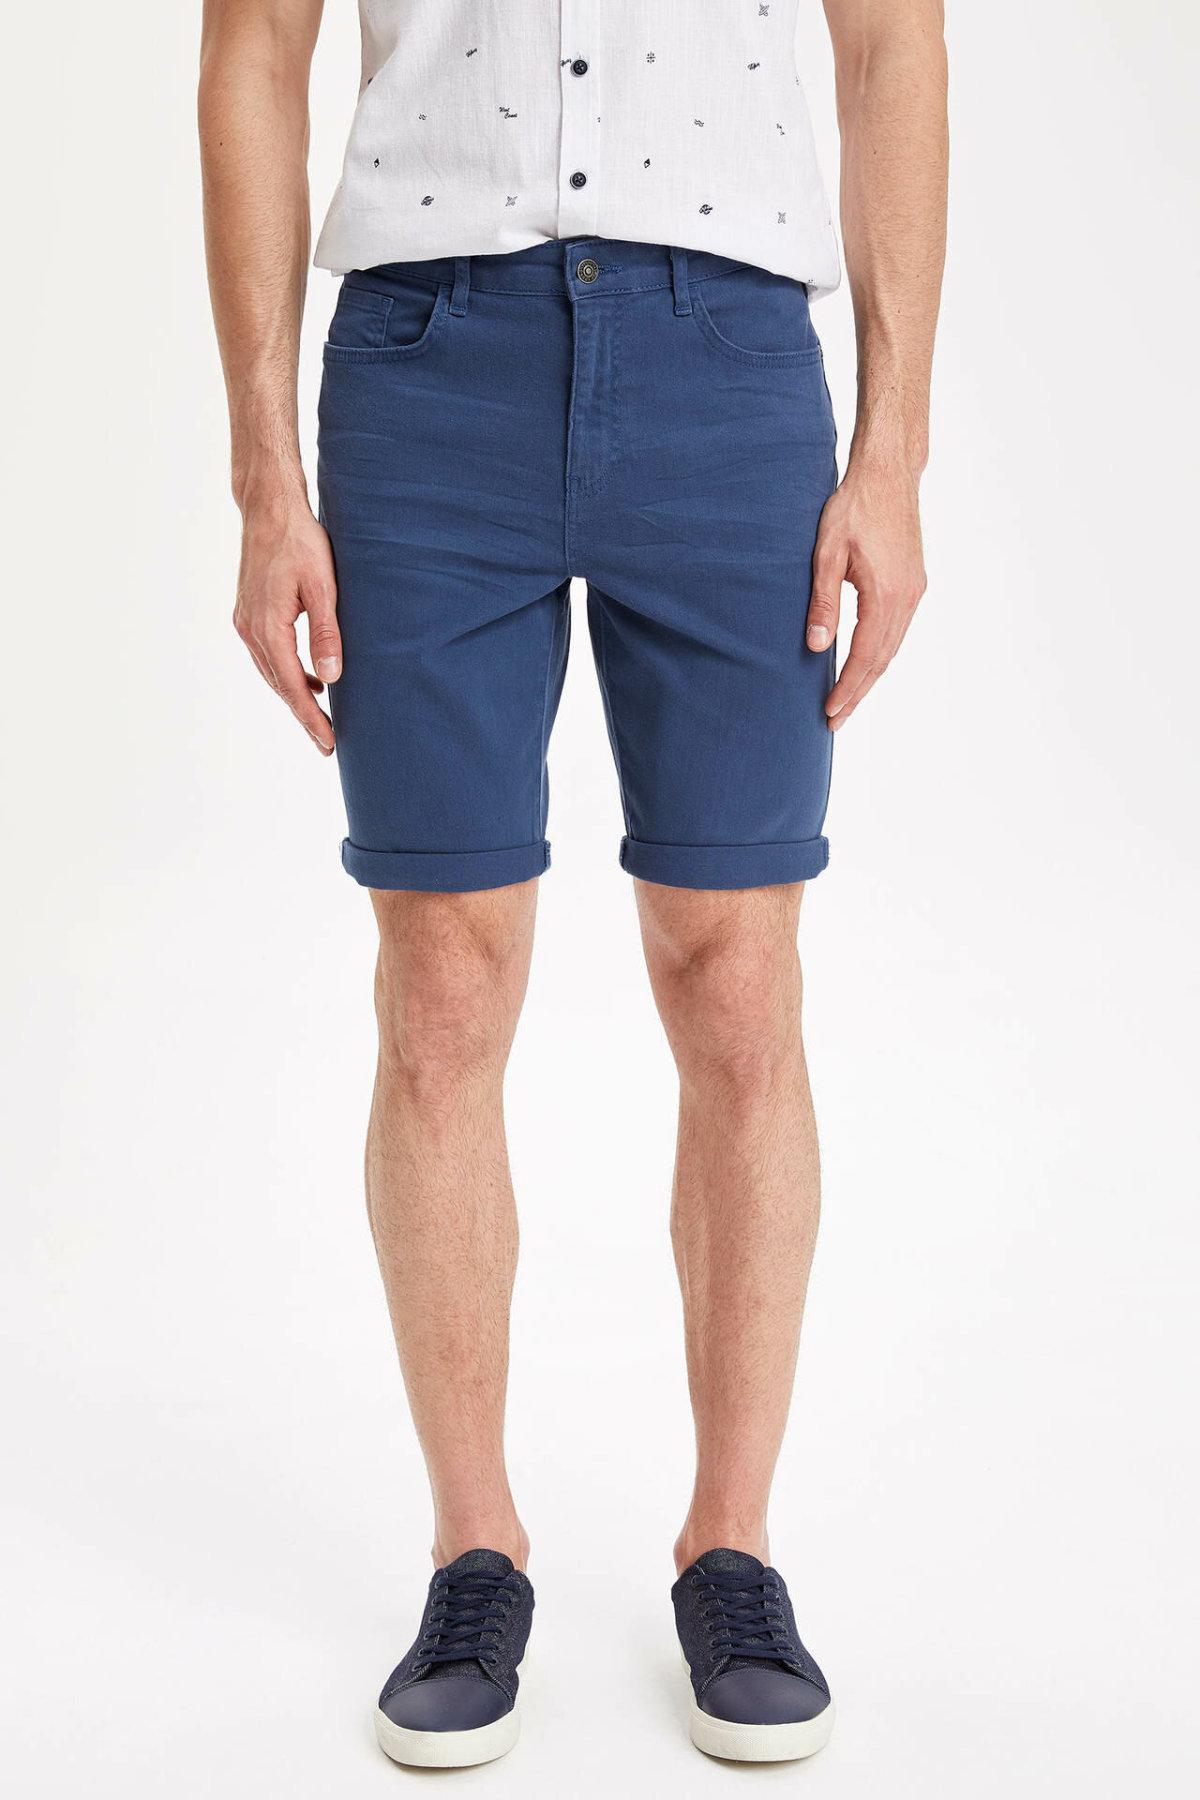 DeFacto Fashion Man Button Shorts Male Casual Zipper Short Pants High Quality Men's Comfortable Shorts Blue - J9772AZ19SM